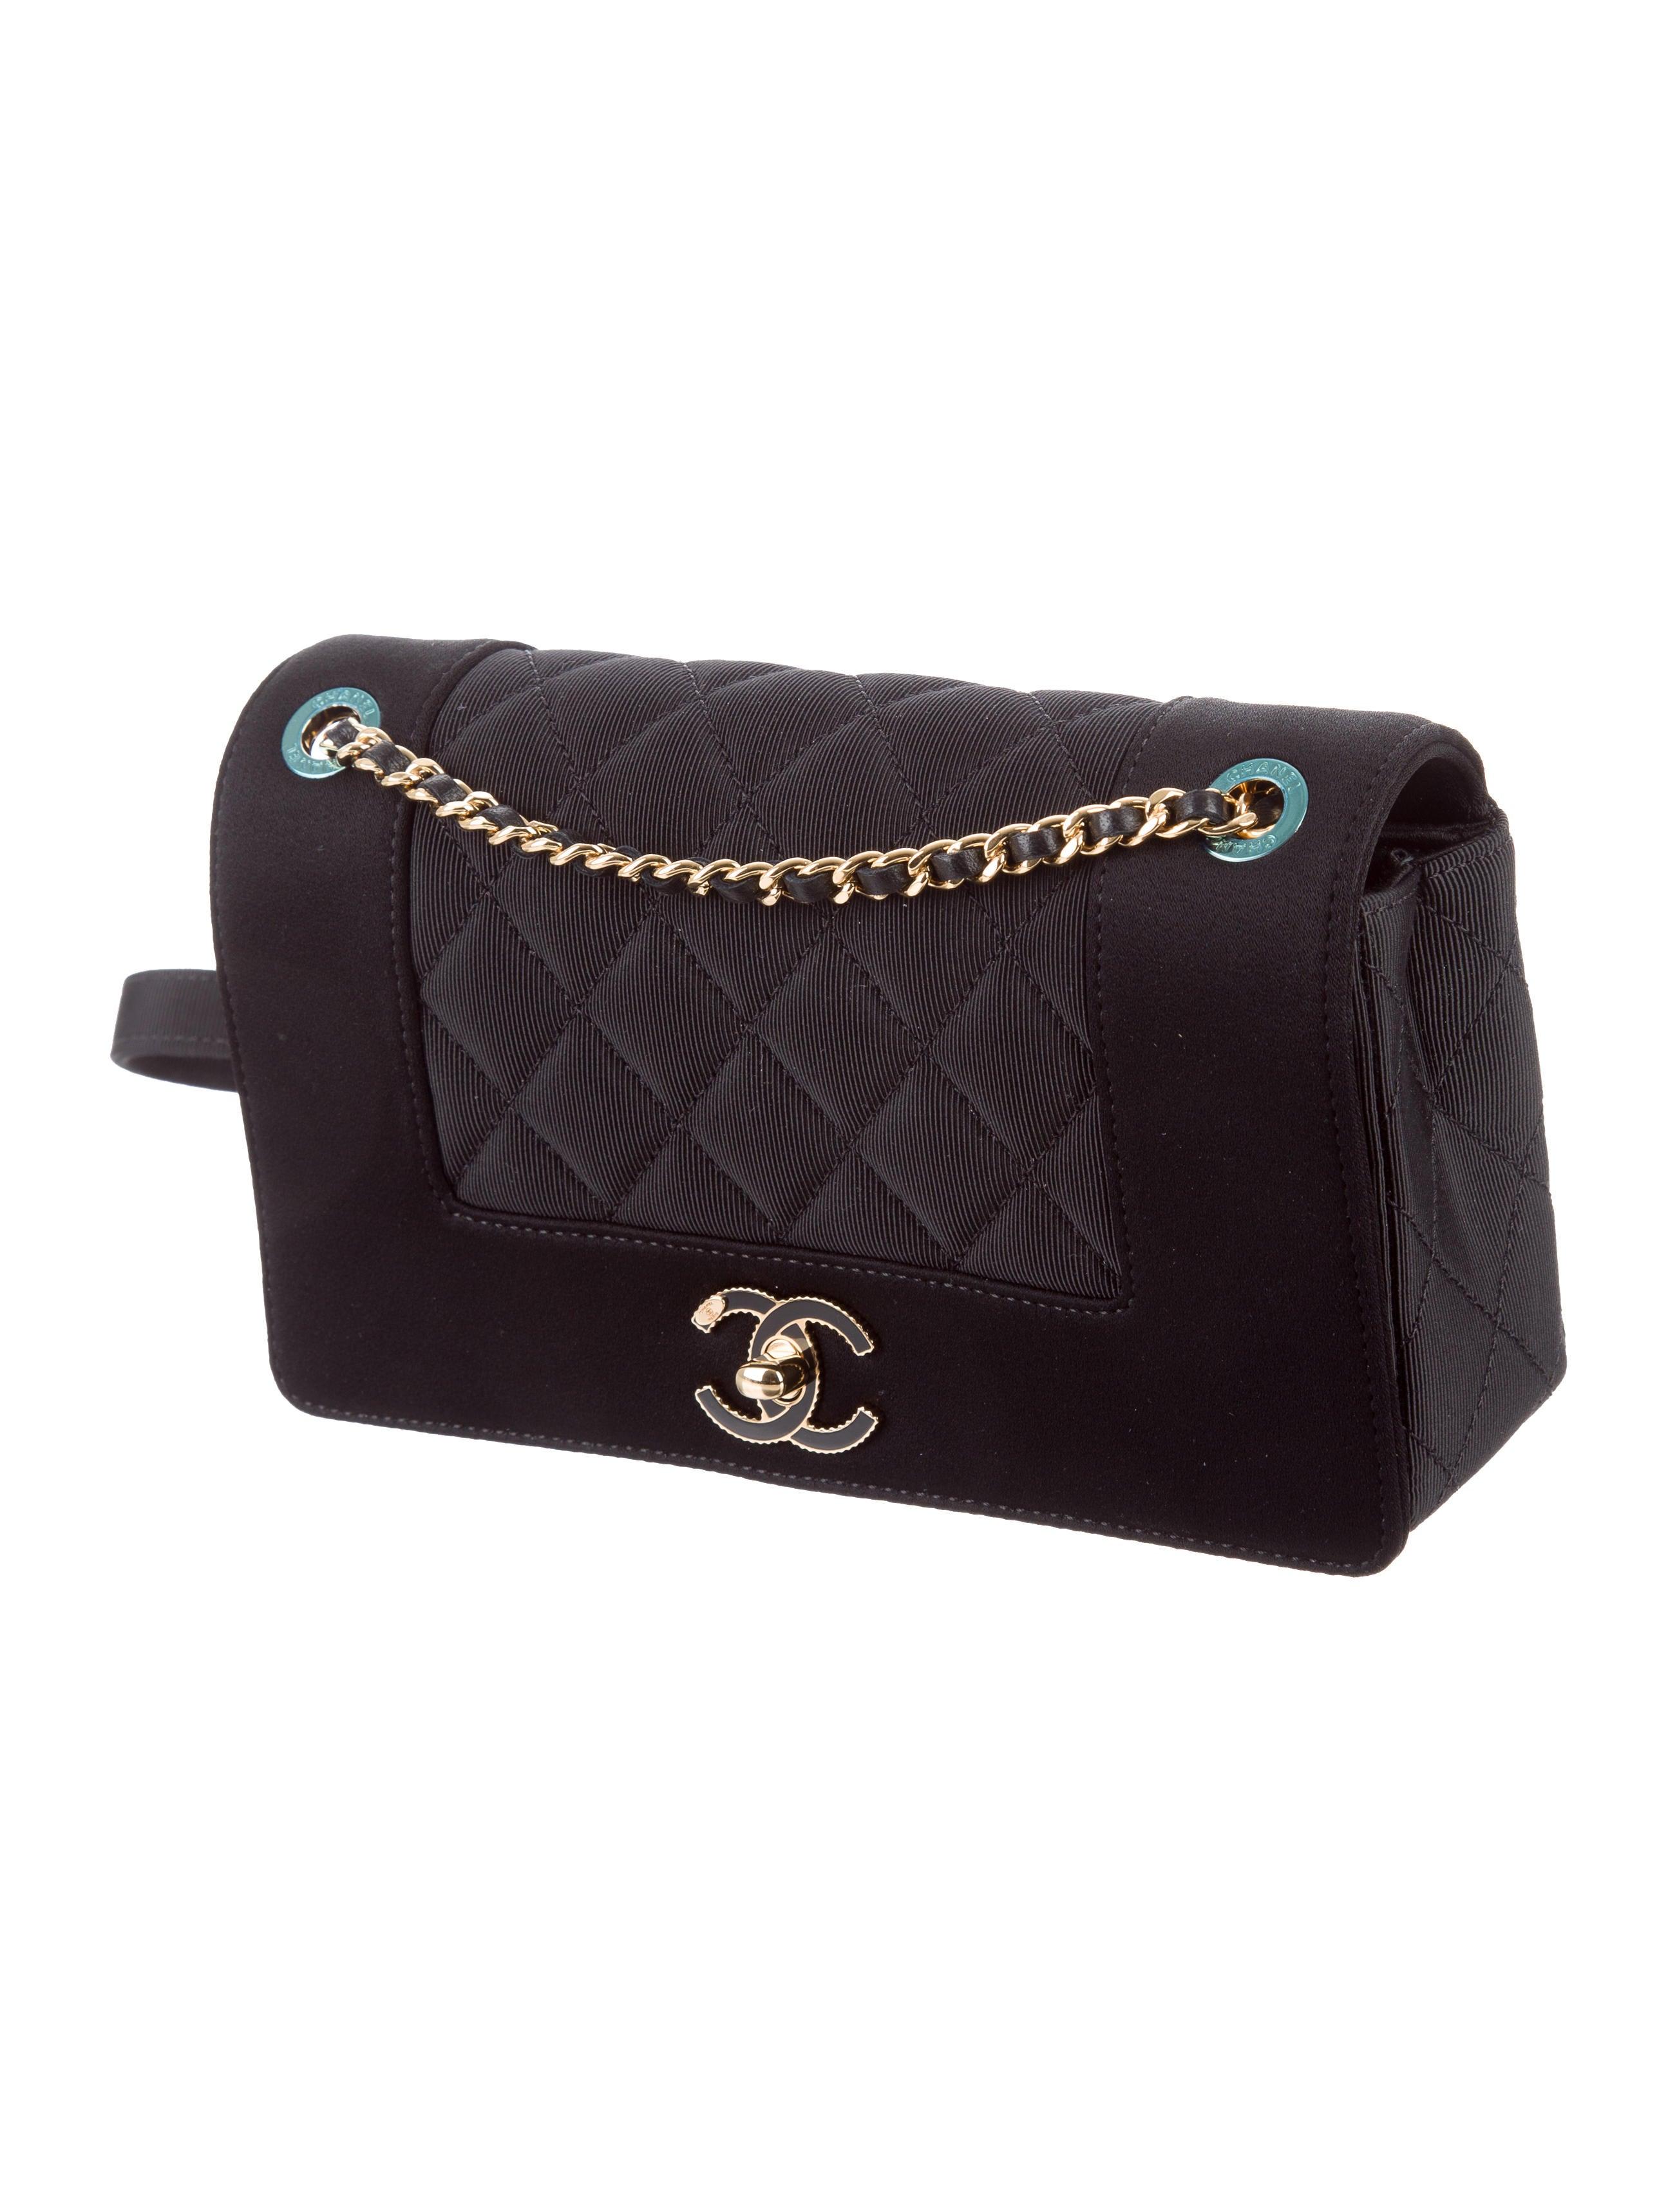 fcec9254dd93 Chanel Classic Handbags 2015. Chanel 2015 Mademoiselle Vintage Flap ...